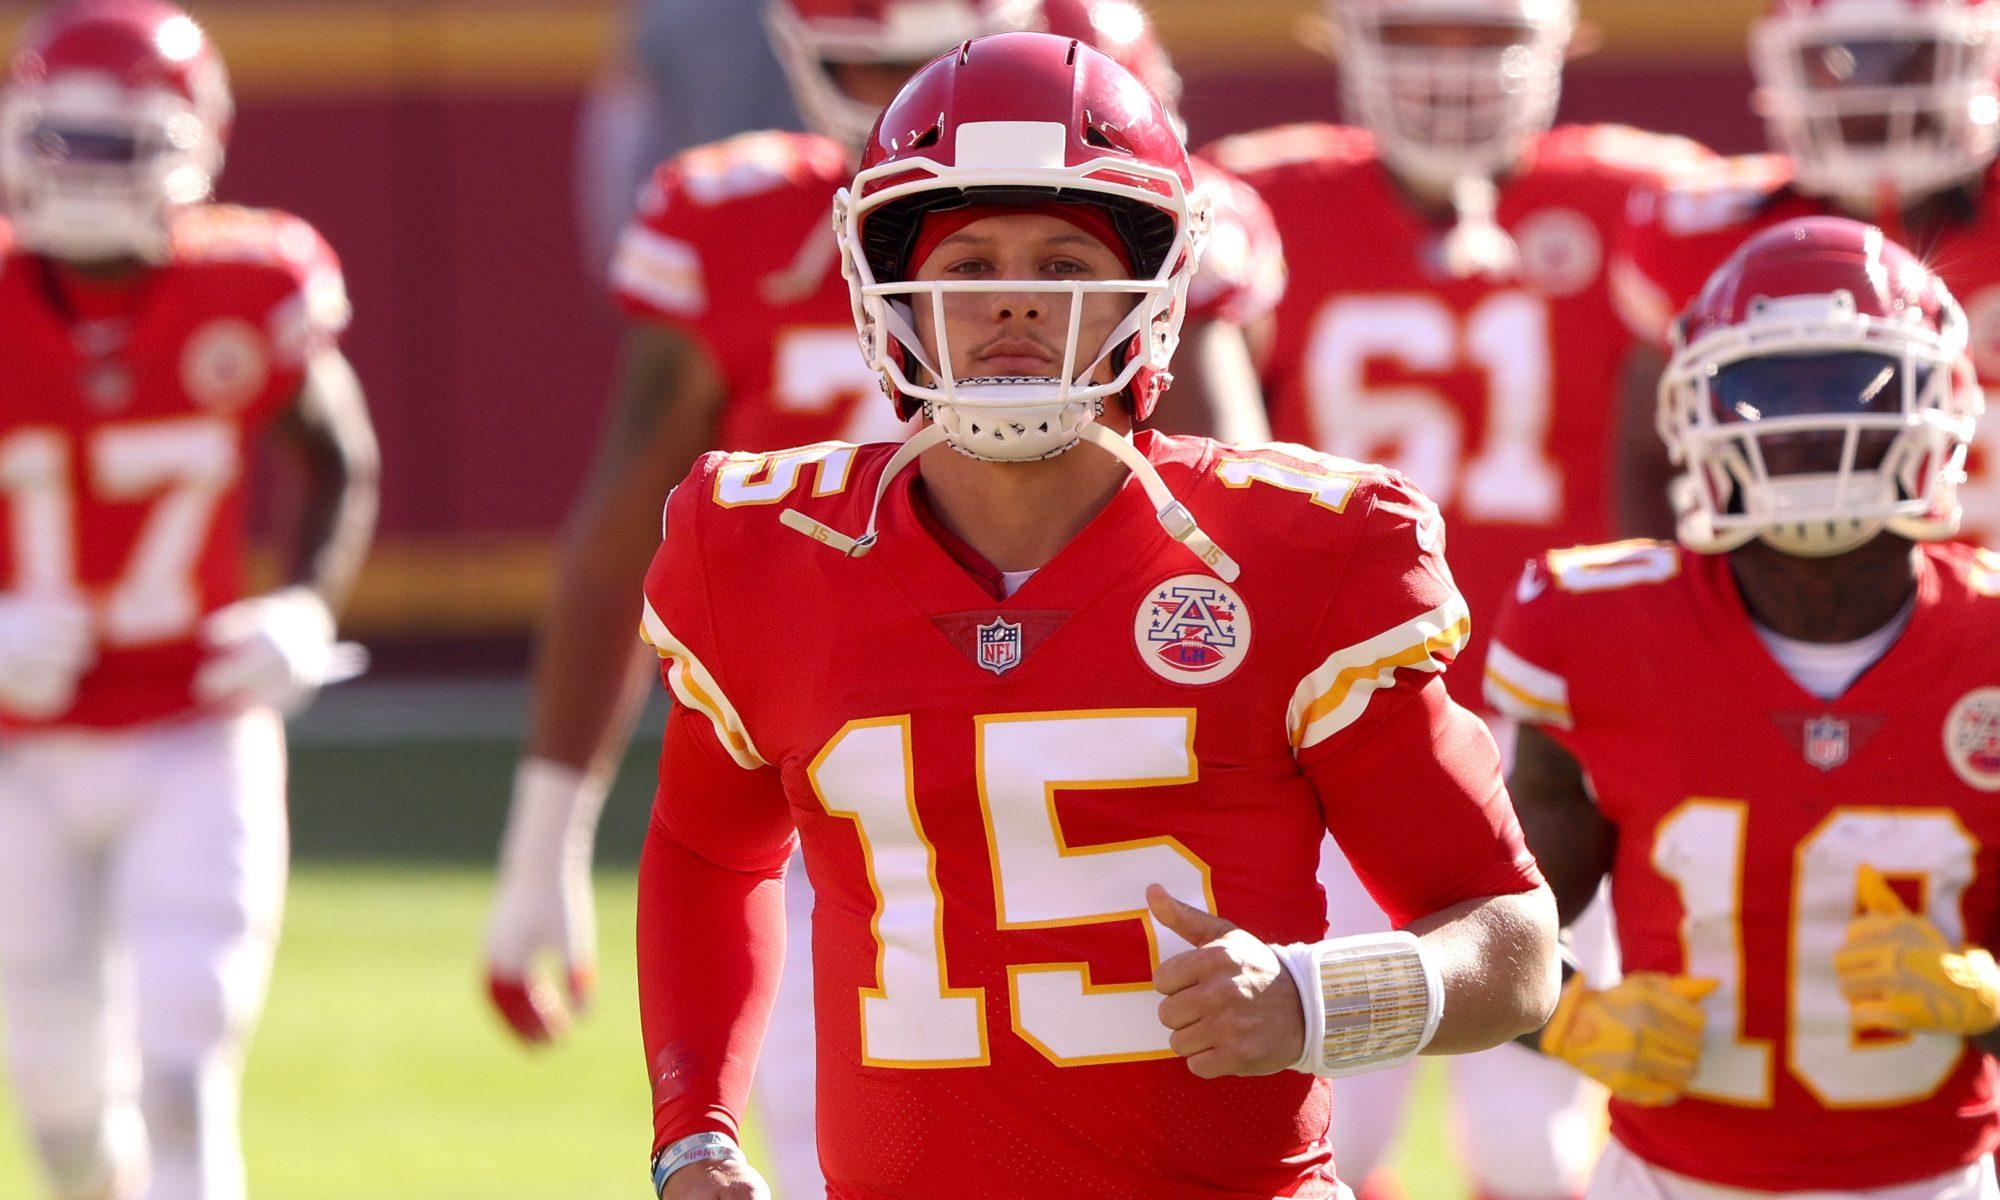 patrick-mahomes-injury-status-updates-chiefs-quarterback-concussion-bills-playoffs